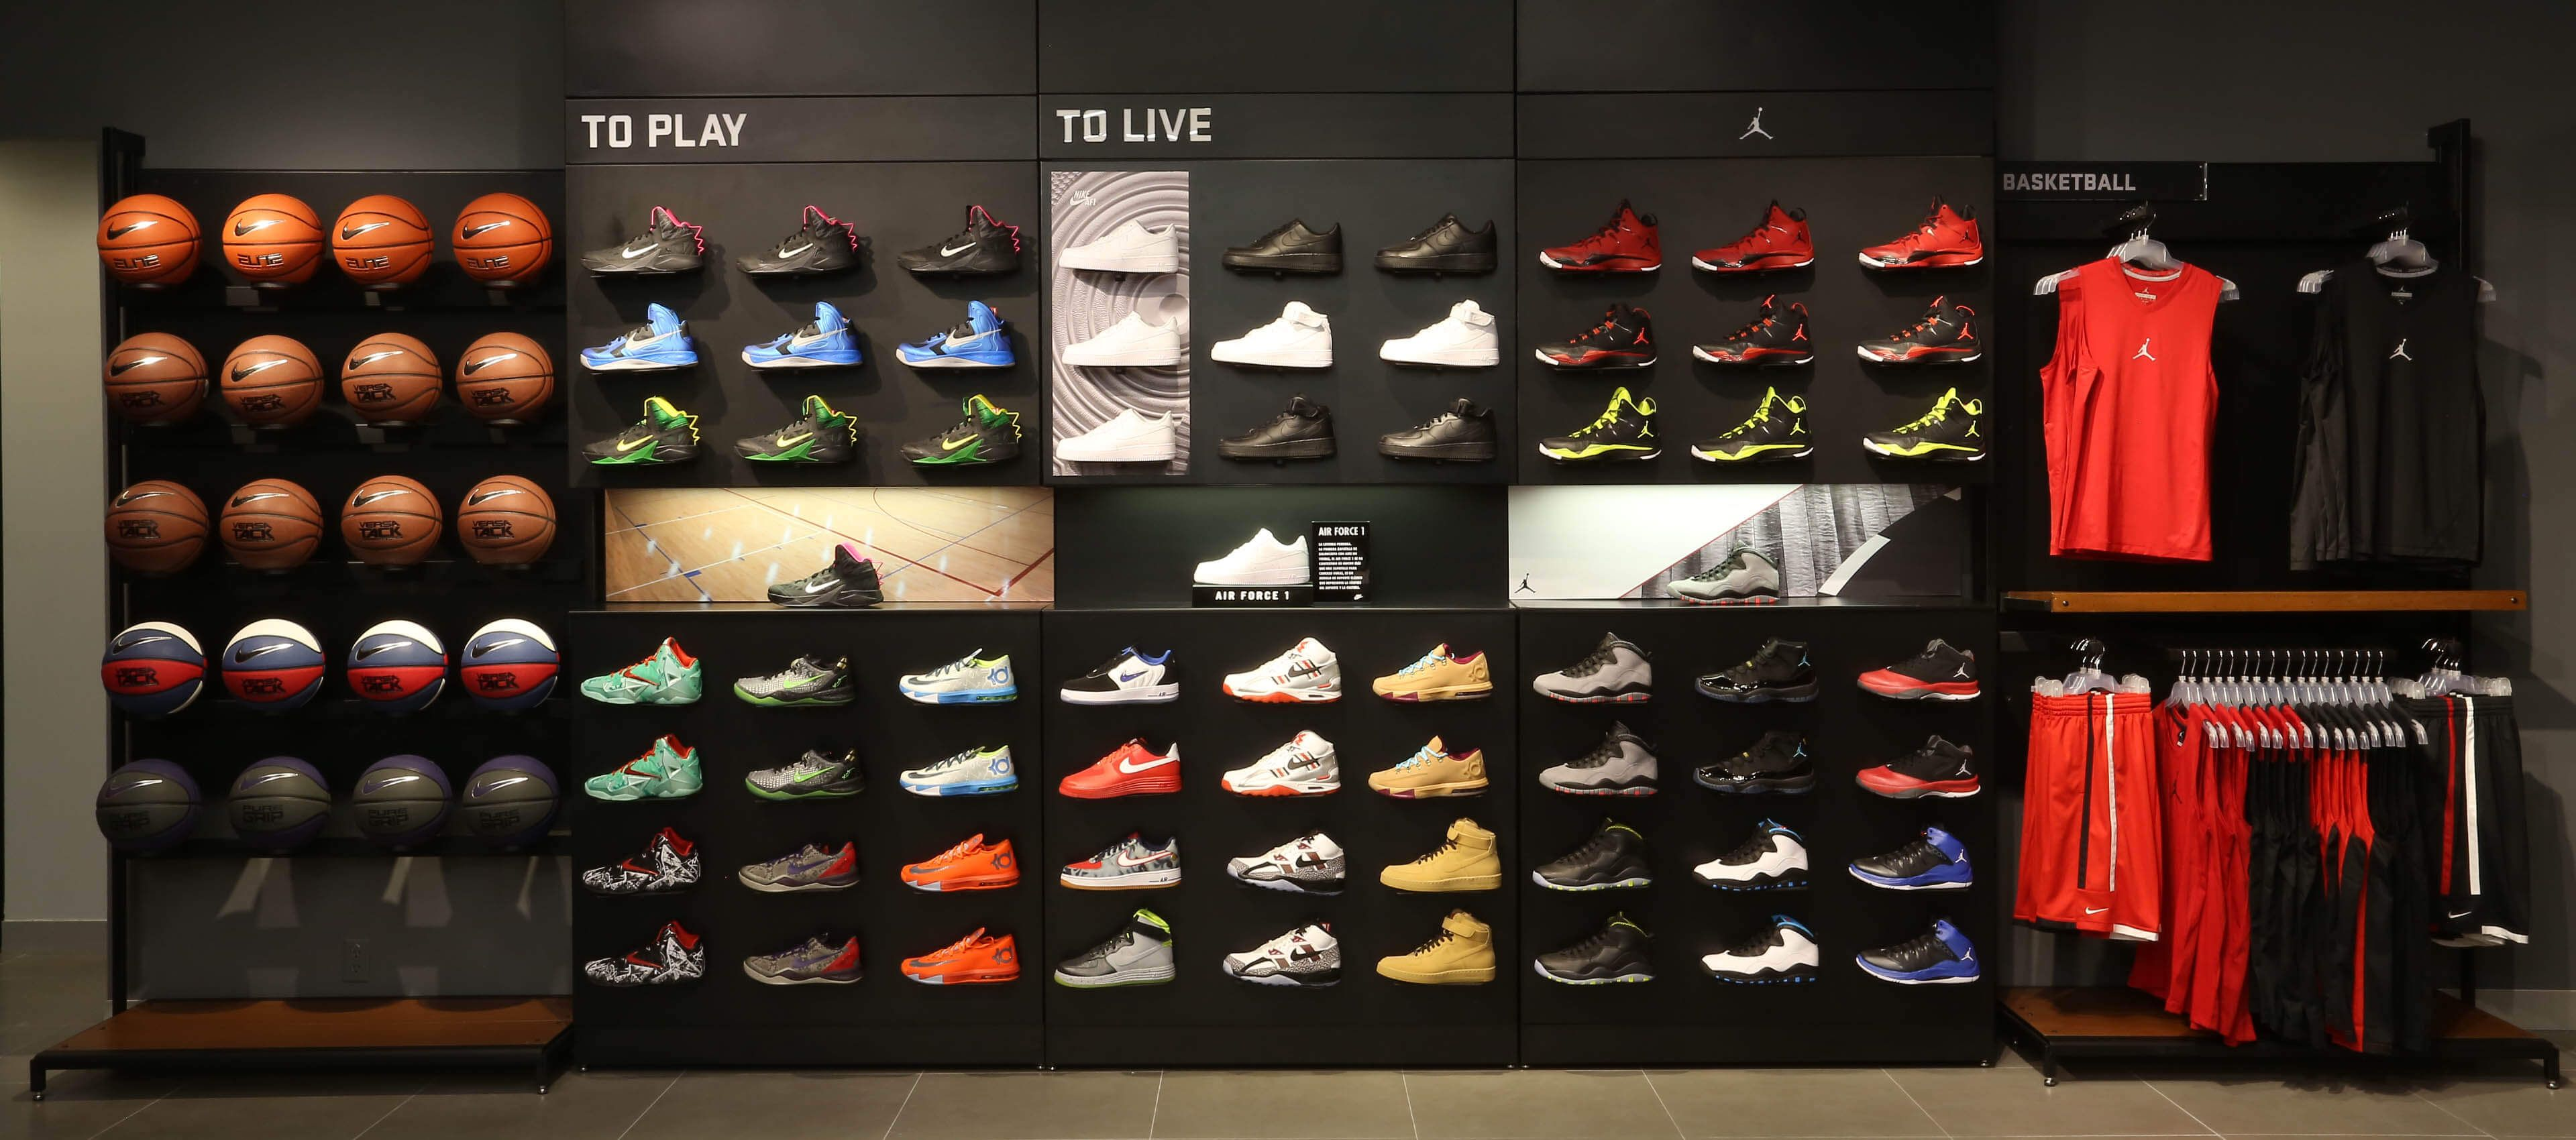 How To Pick The Perfect Athletic Shoes Fytso Magazine Tienda De Zapatos Nike Store Diseño De Tienda De Boutique